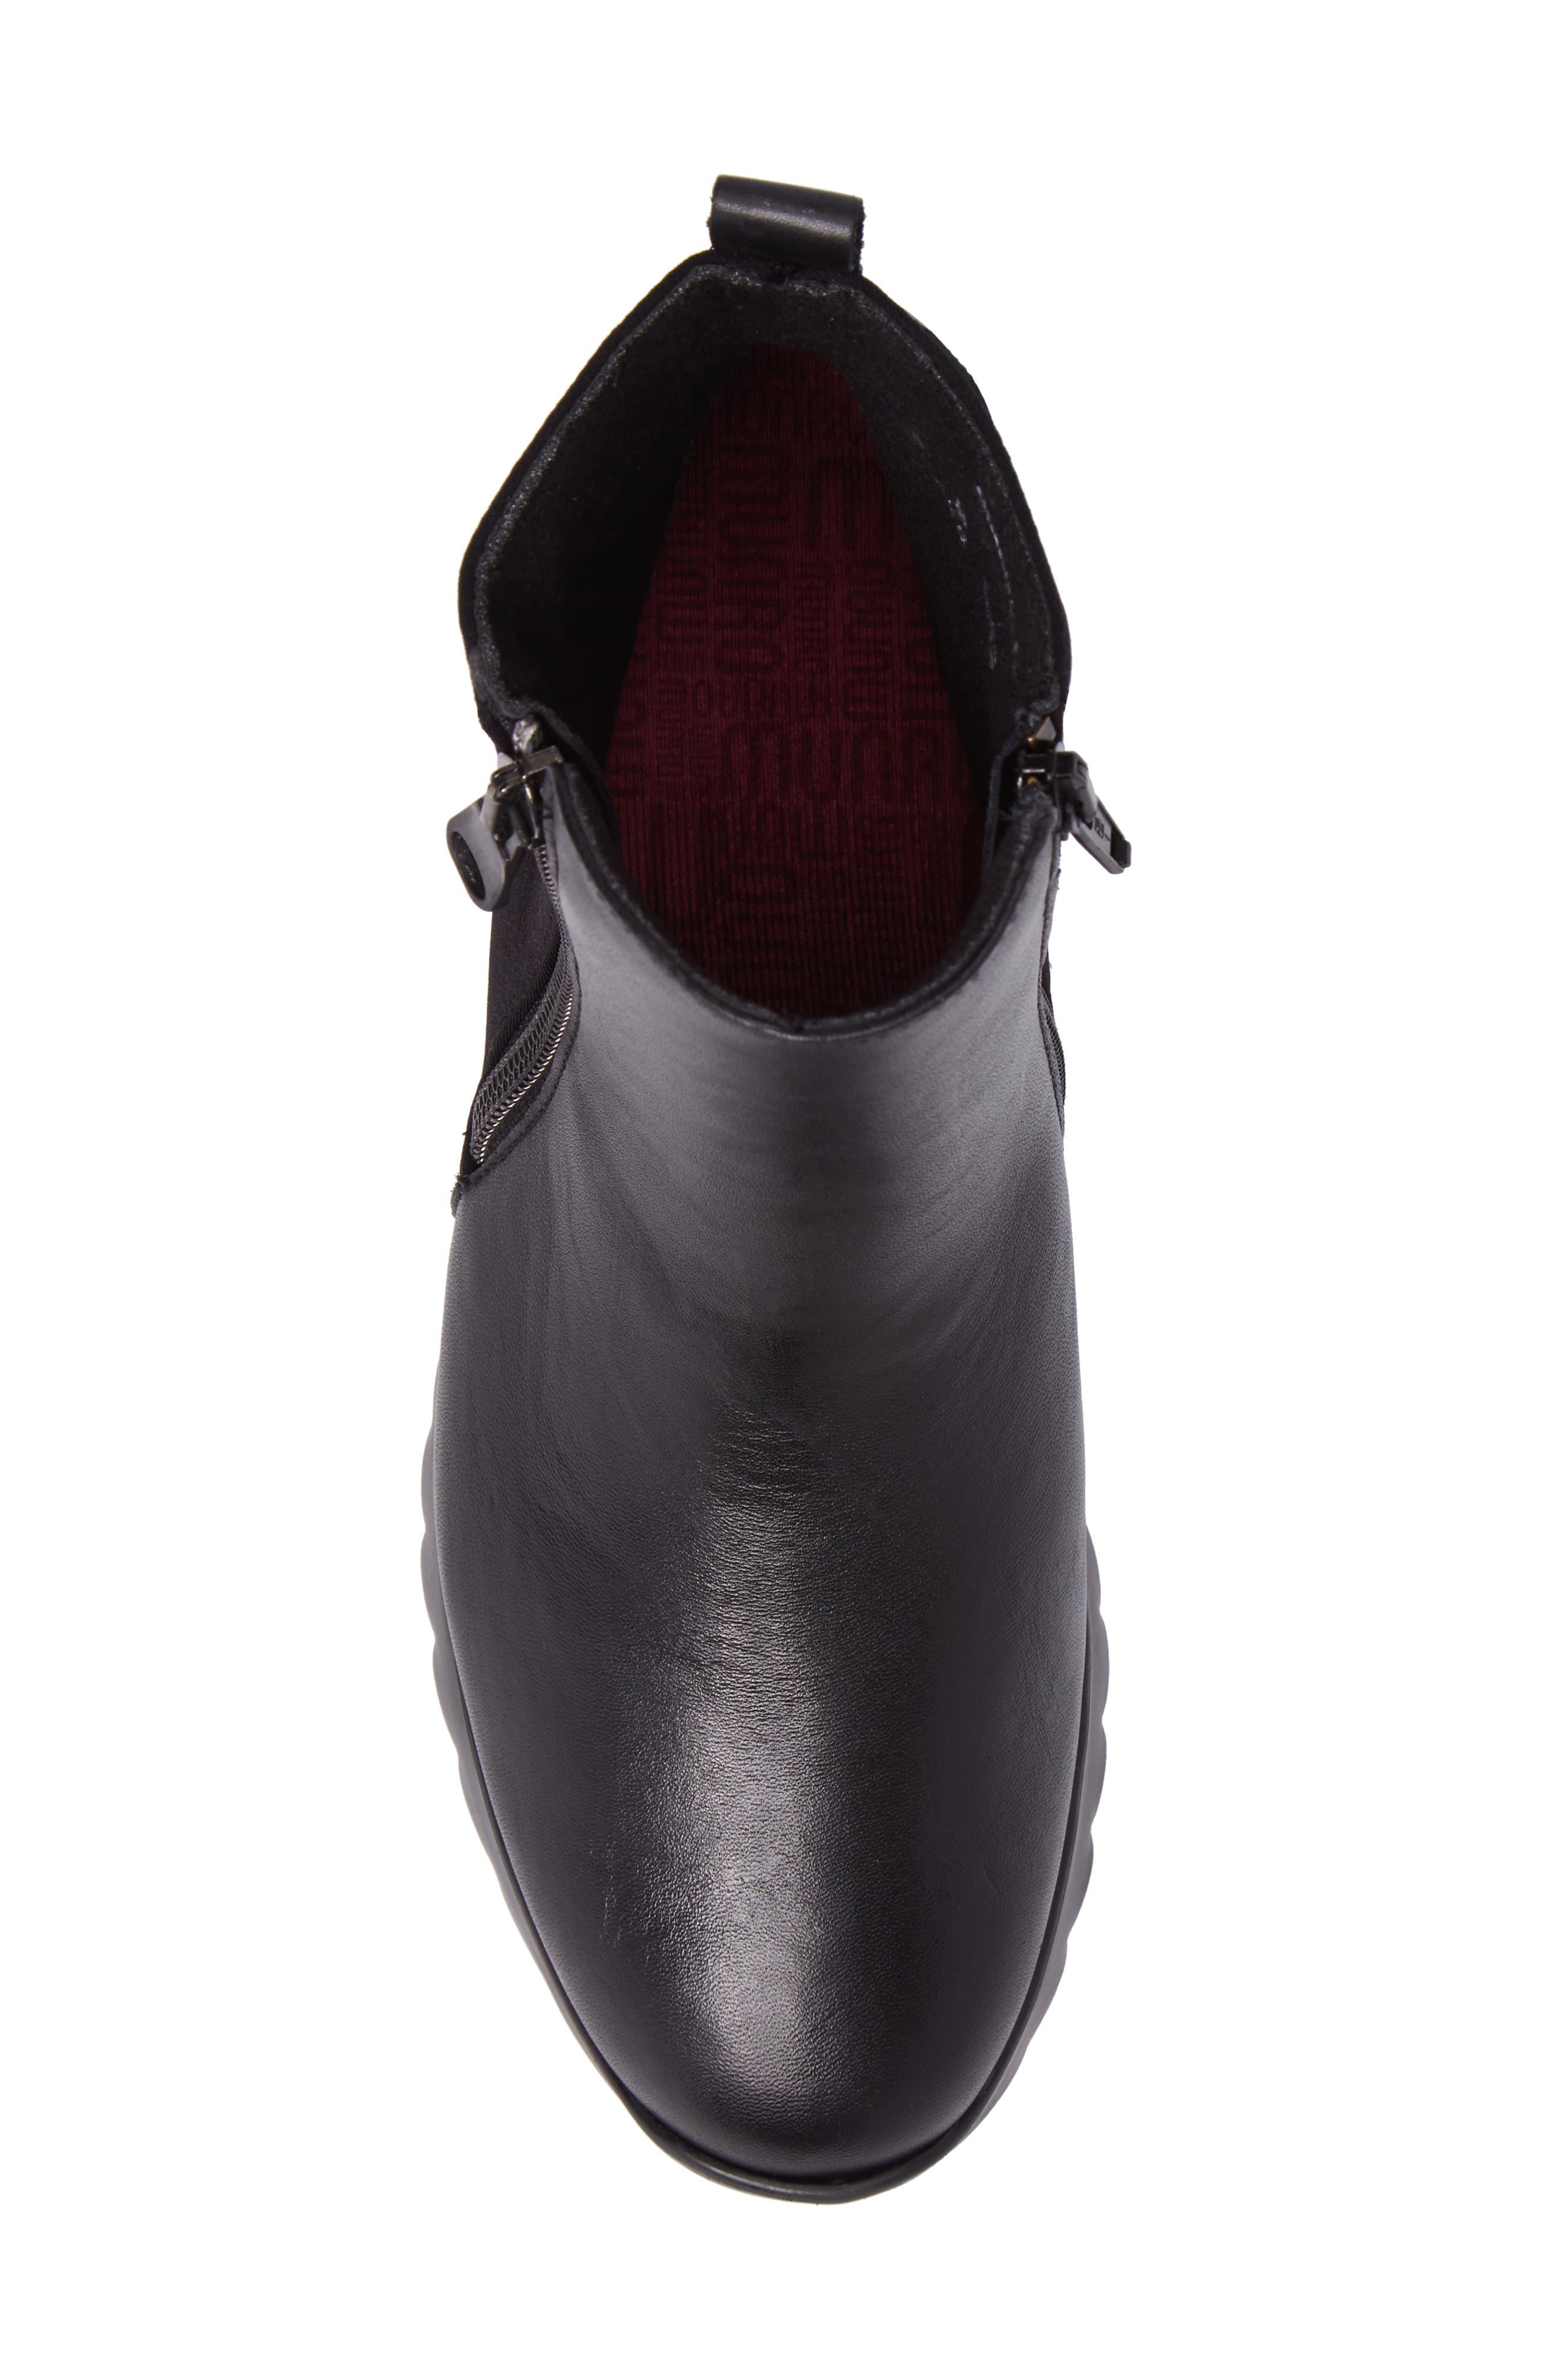 Ashcroft Bootie,                             Alternate thumbnail 5, color,                             Black Leather